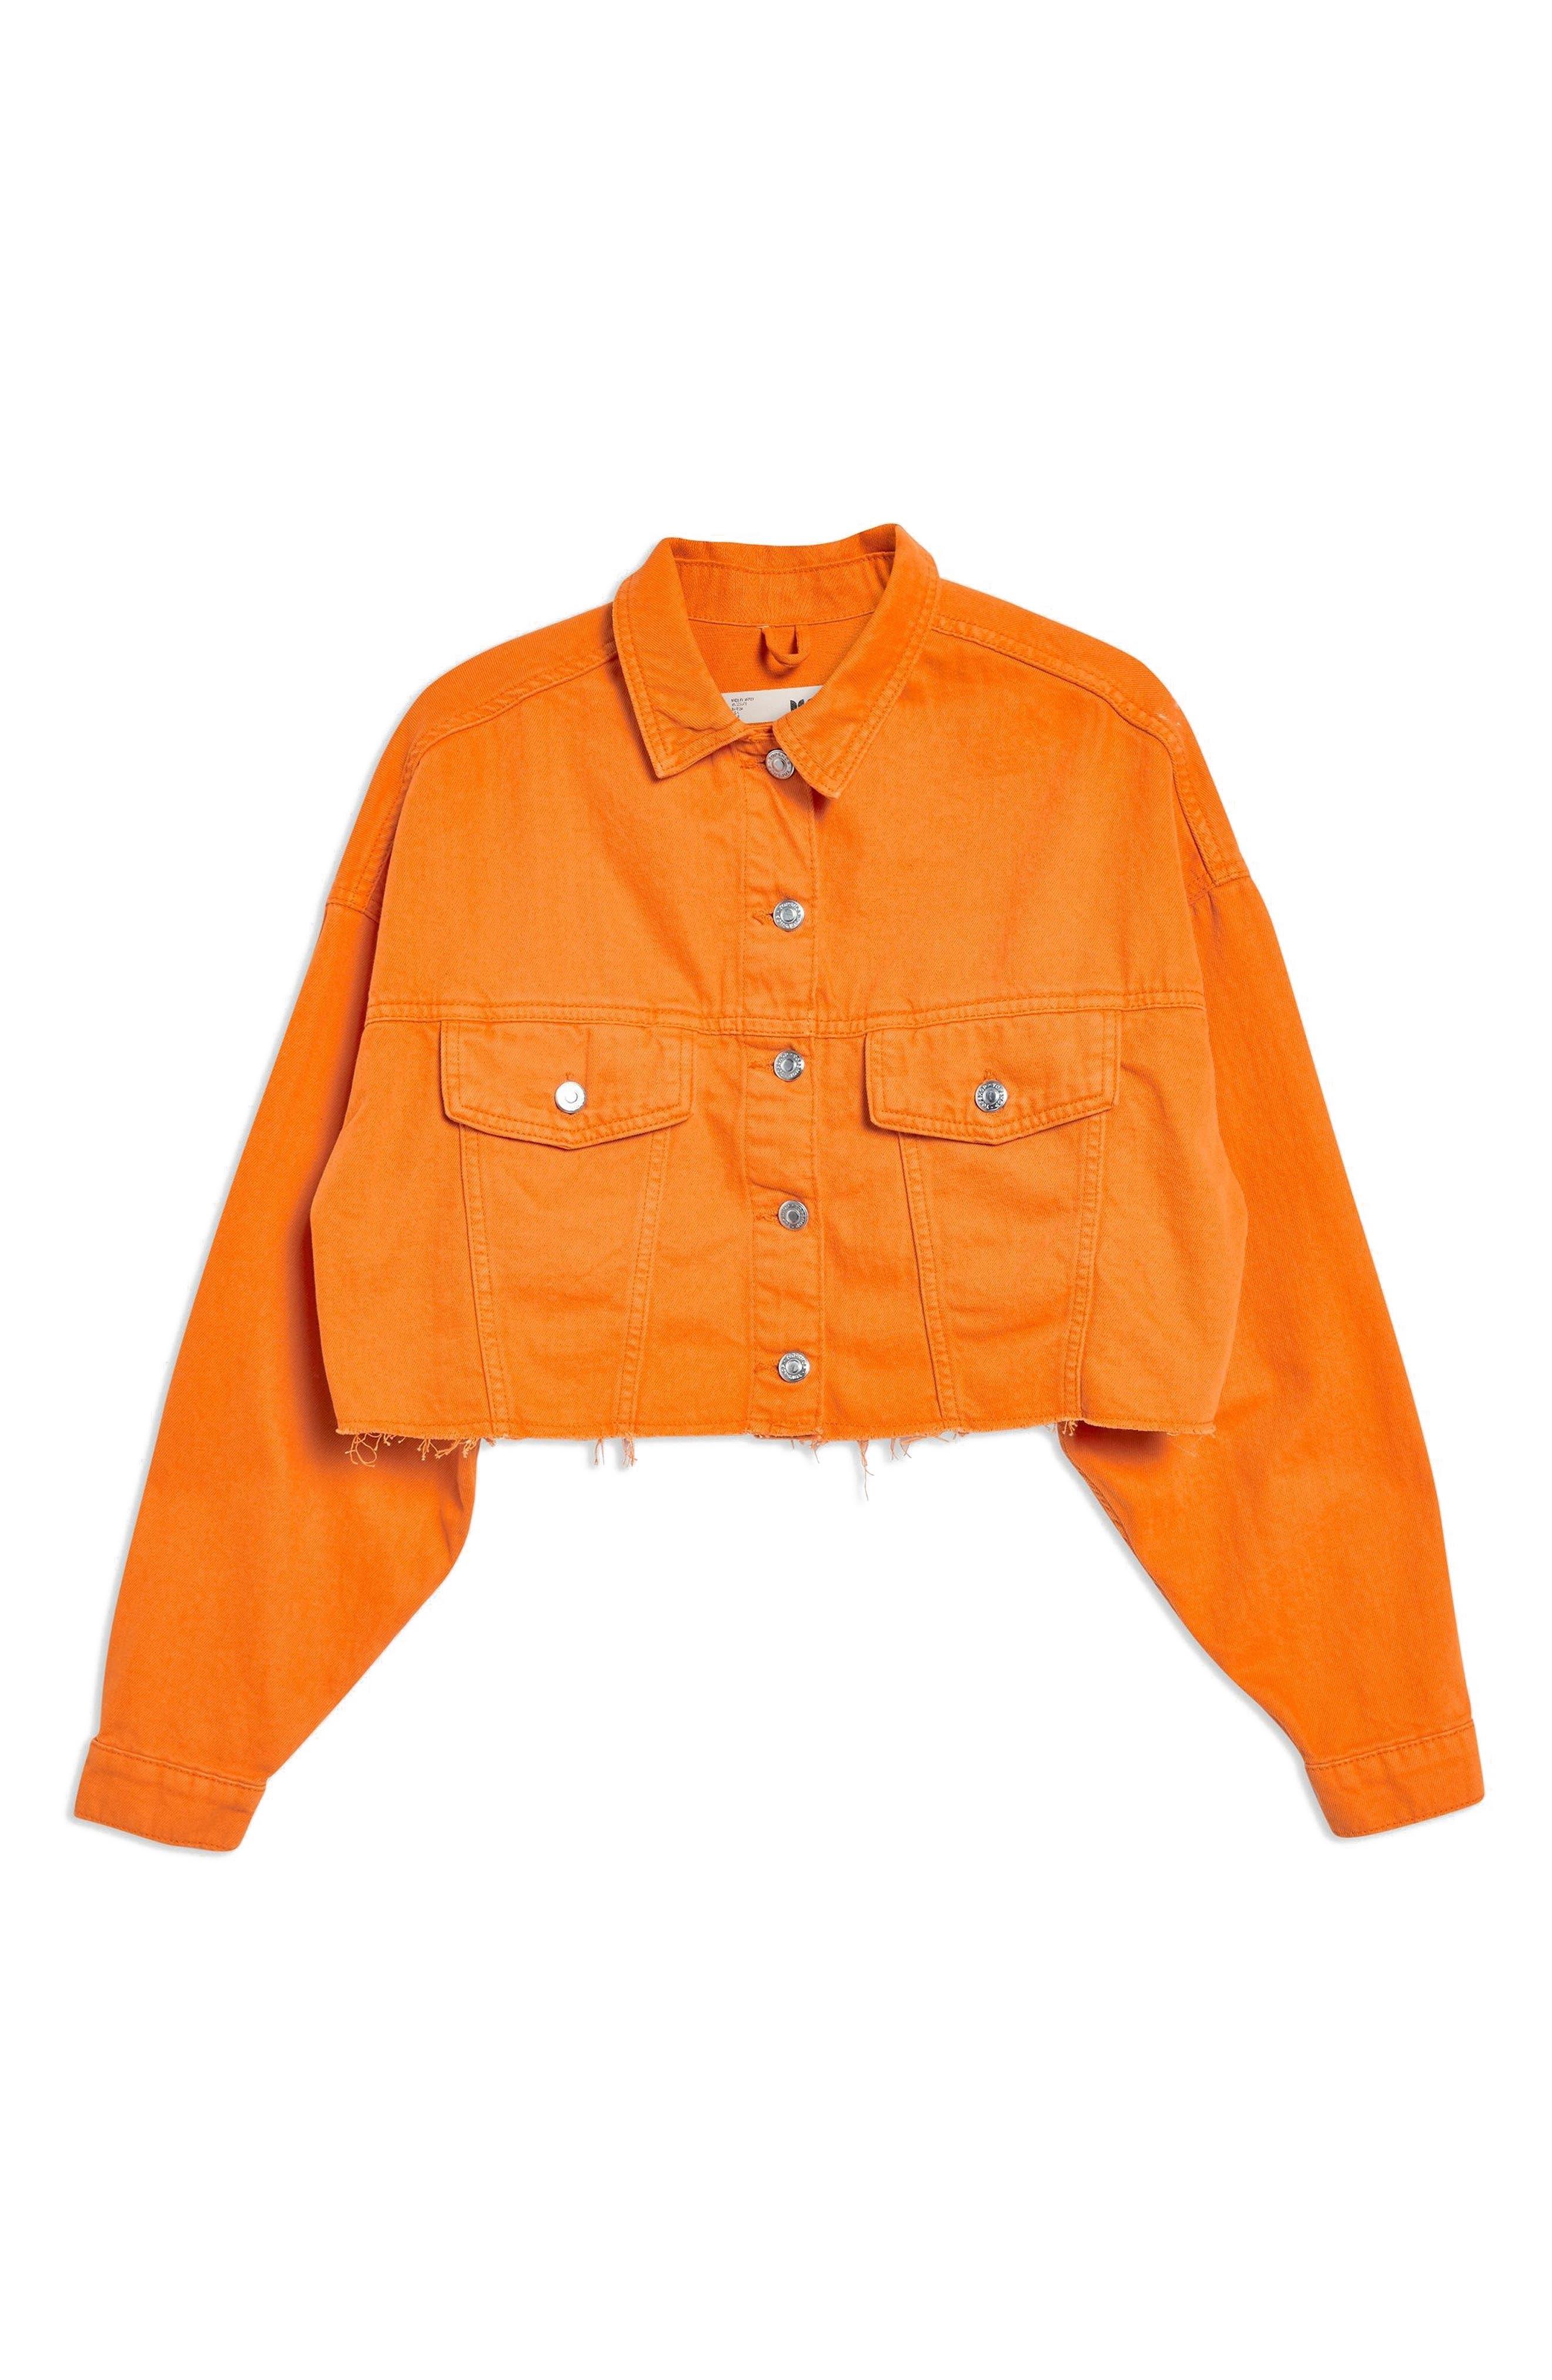 MOTO Hacked Crop Denim Jacket,                             Alternate thumbnail 4, color,                             800